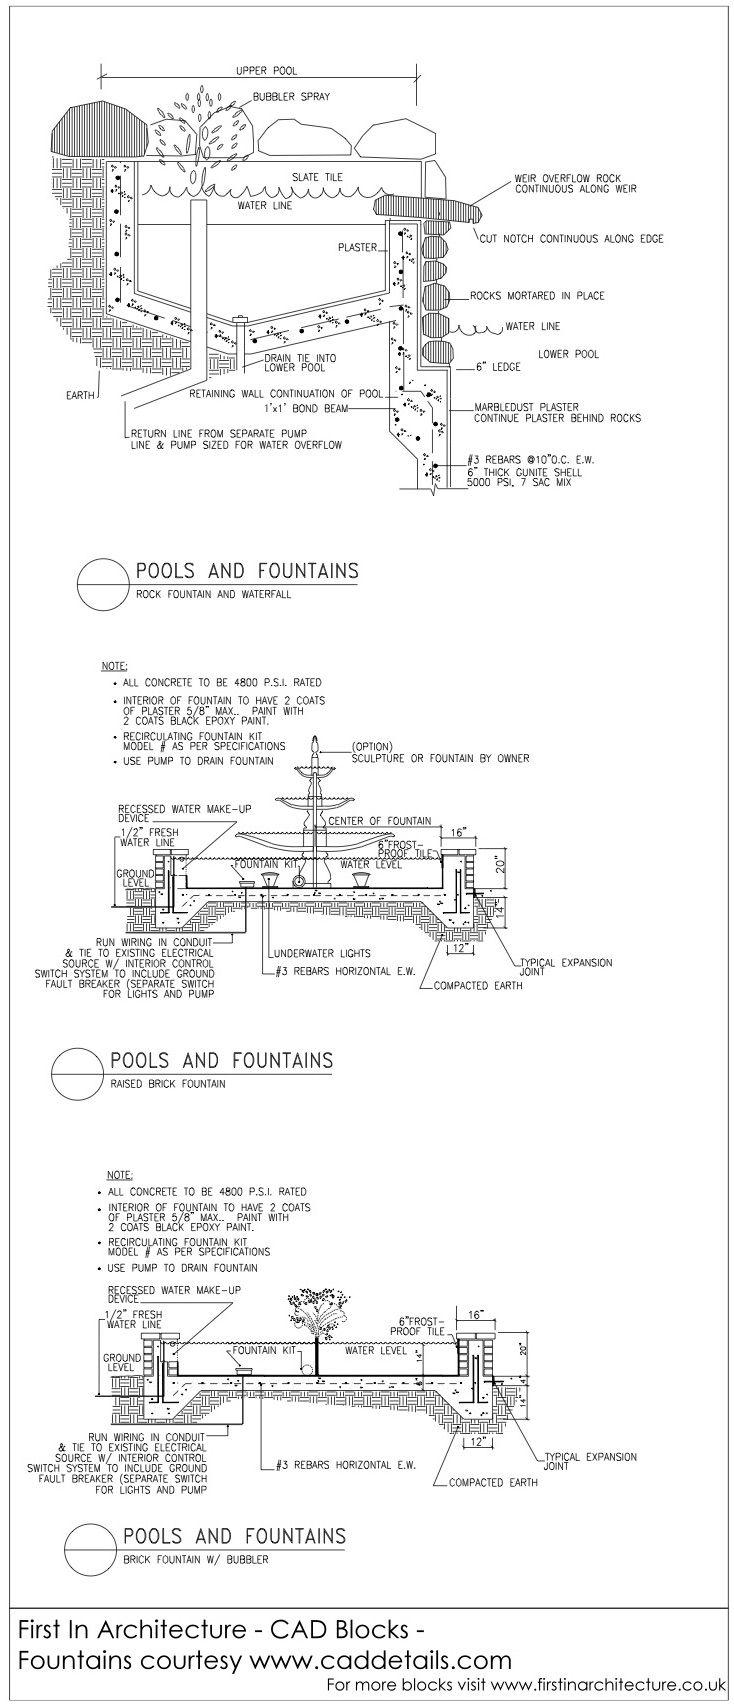 FIA CAD Blocks Fountains